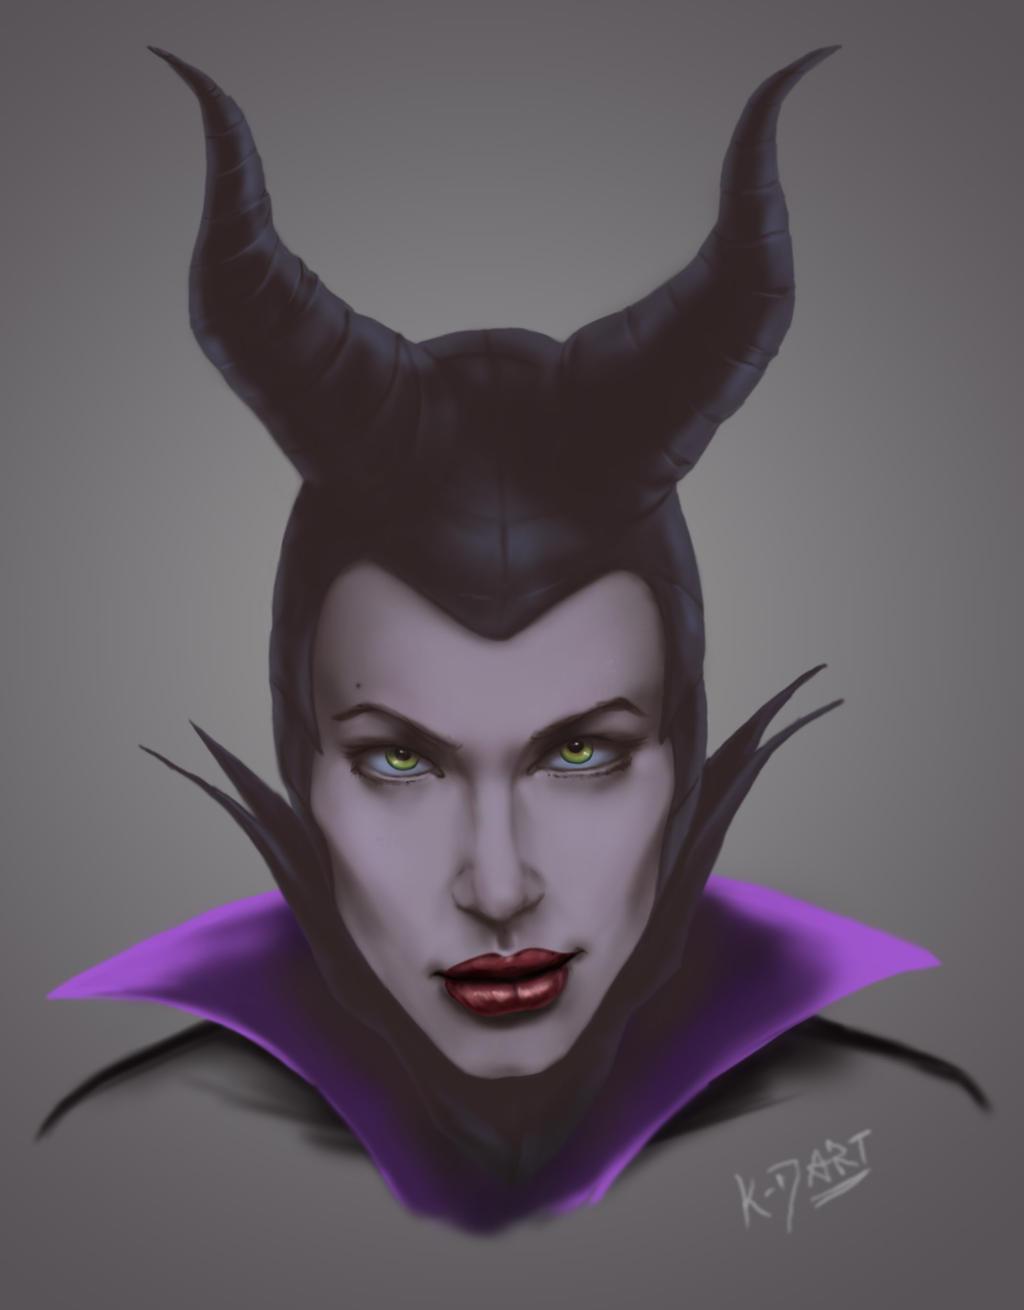 Maleficent Sketch by k-d-art on DeviantArt